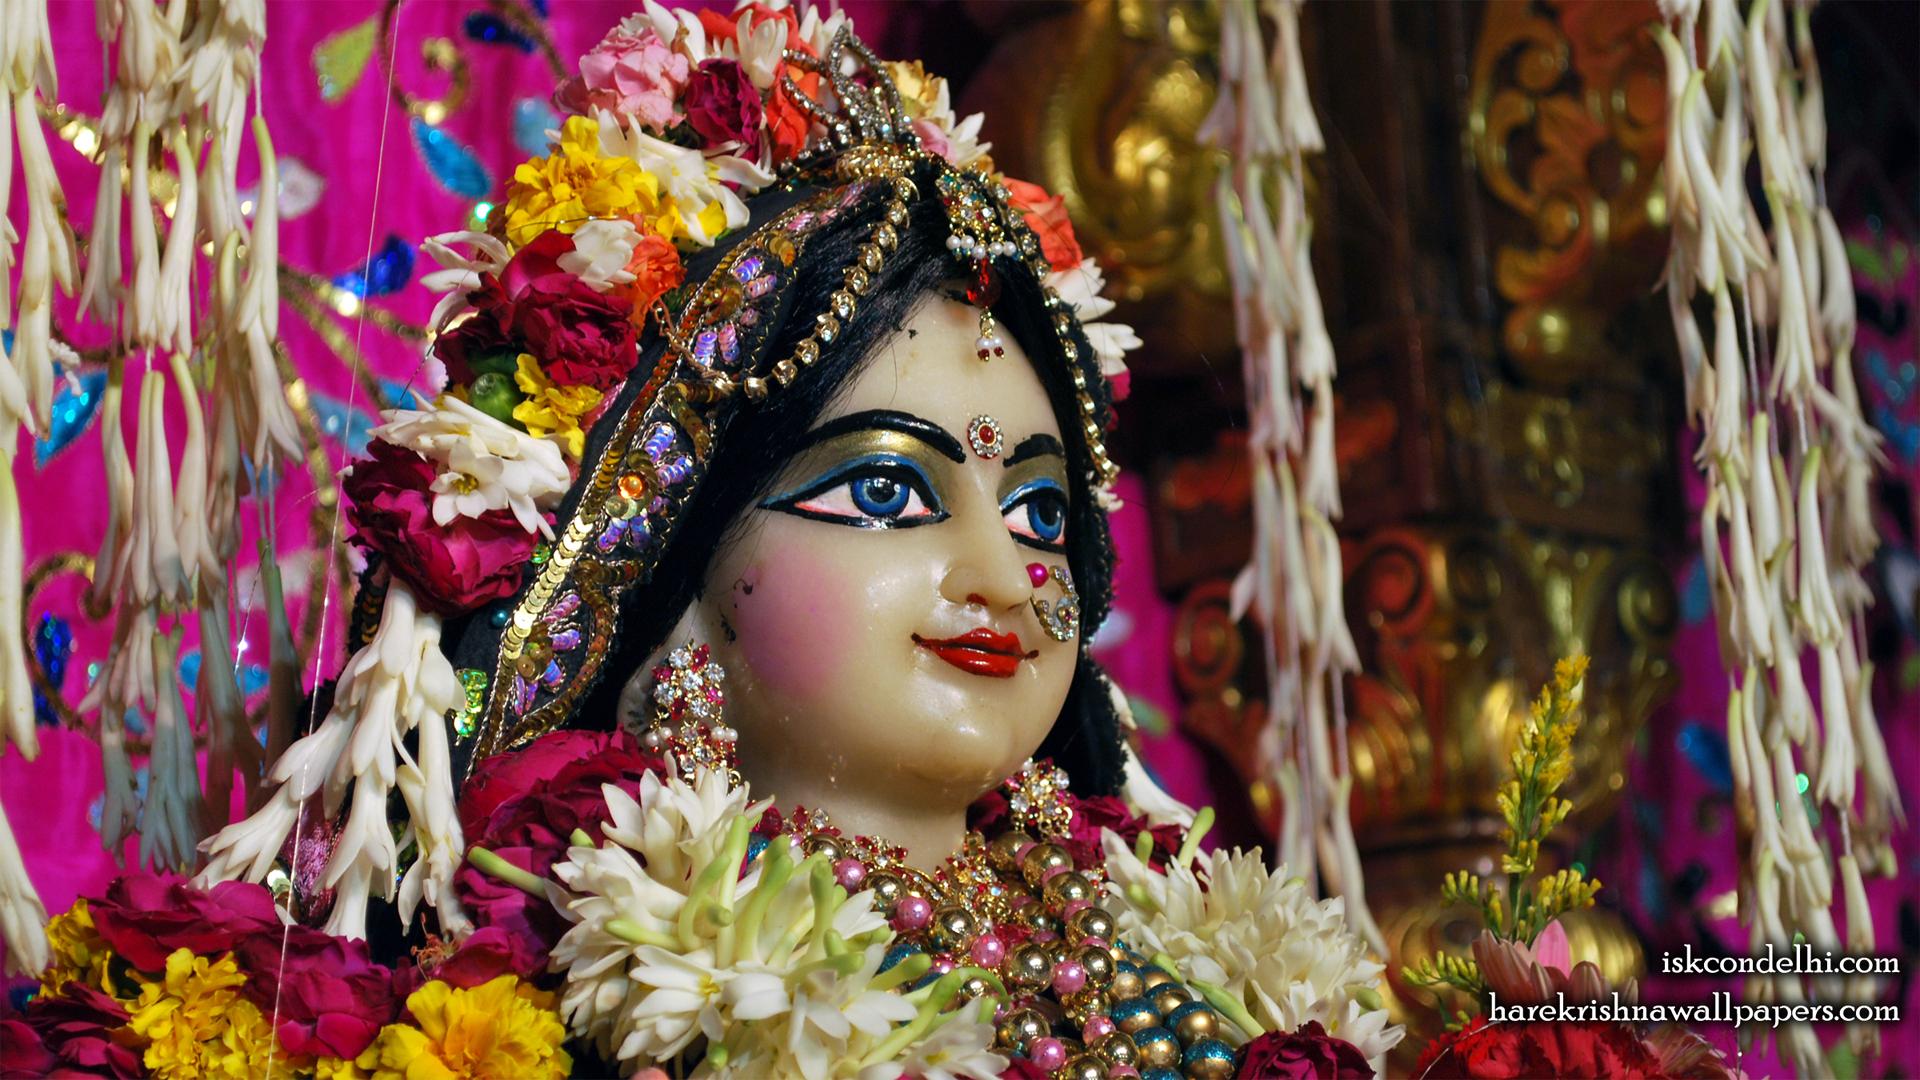 Sri Radha Close up Wallpaper (022) Size 1920x1080 Download